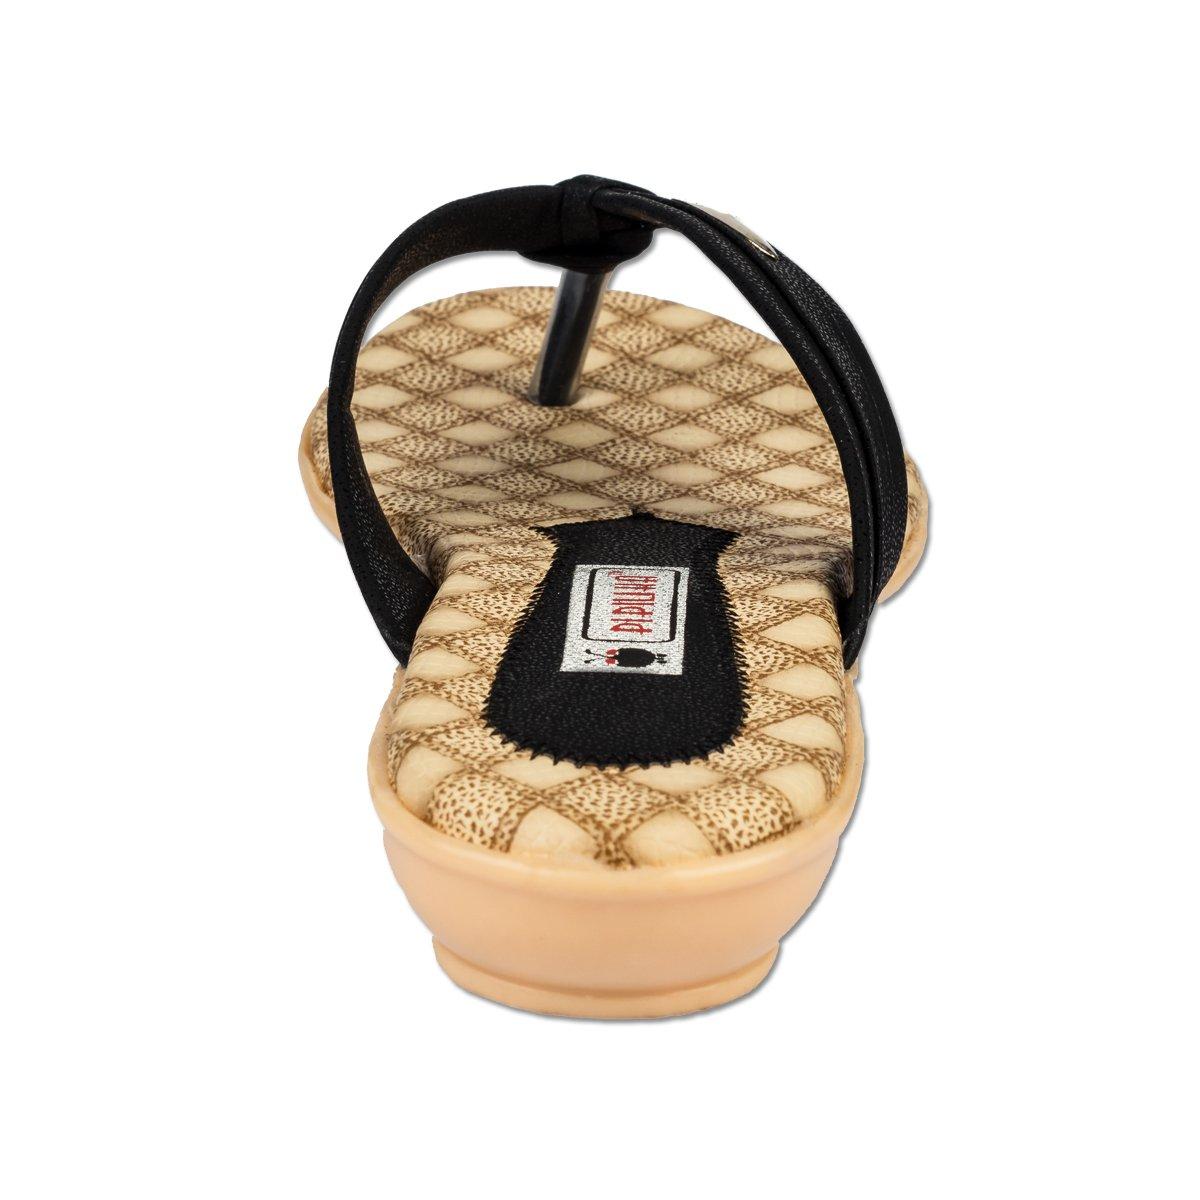 Womens sandals flipkart - Pipilika On Twitter Pipilika Ladybird Pld612b Women Sandal Flats Black Shoes Available On Flipkart Https T Co Dwe6dnwrbs